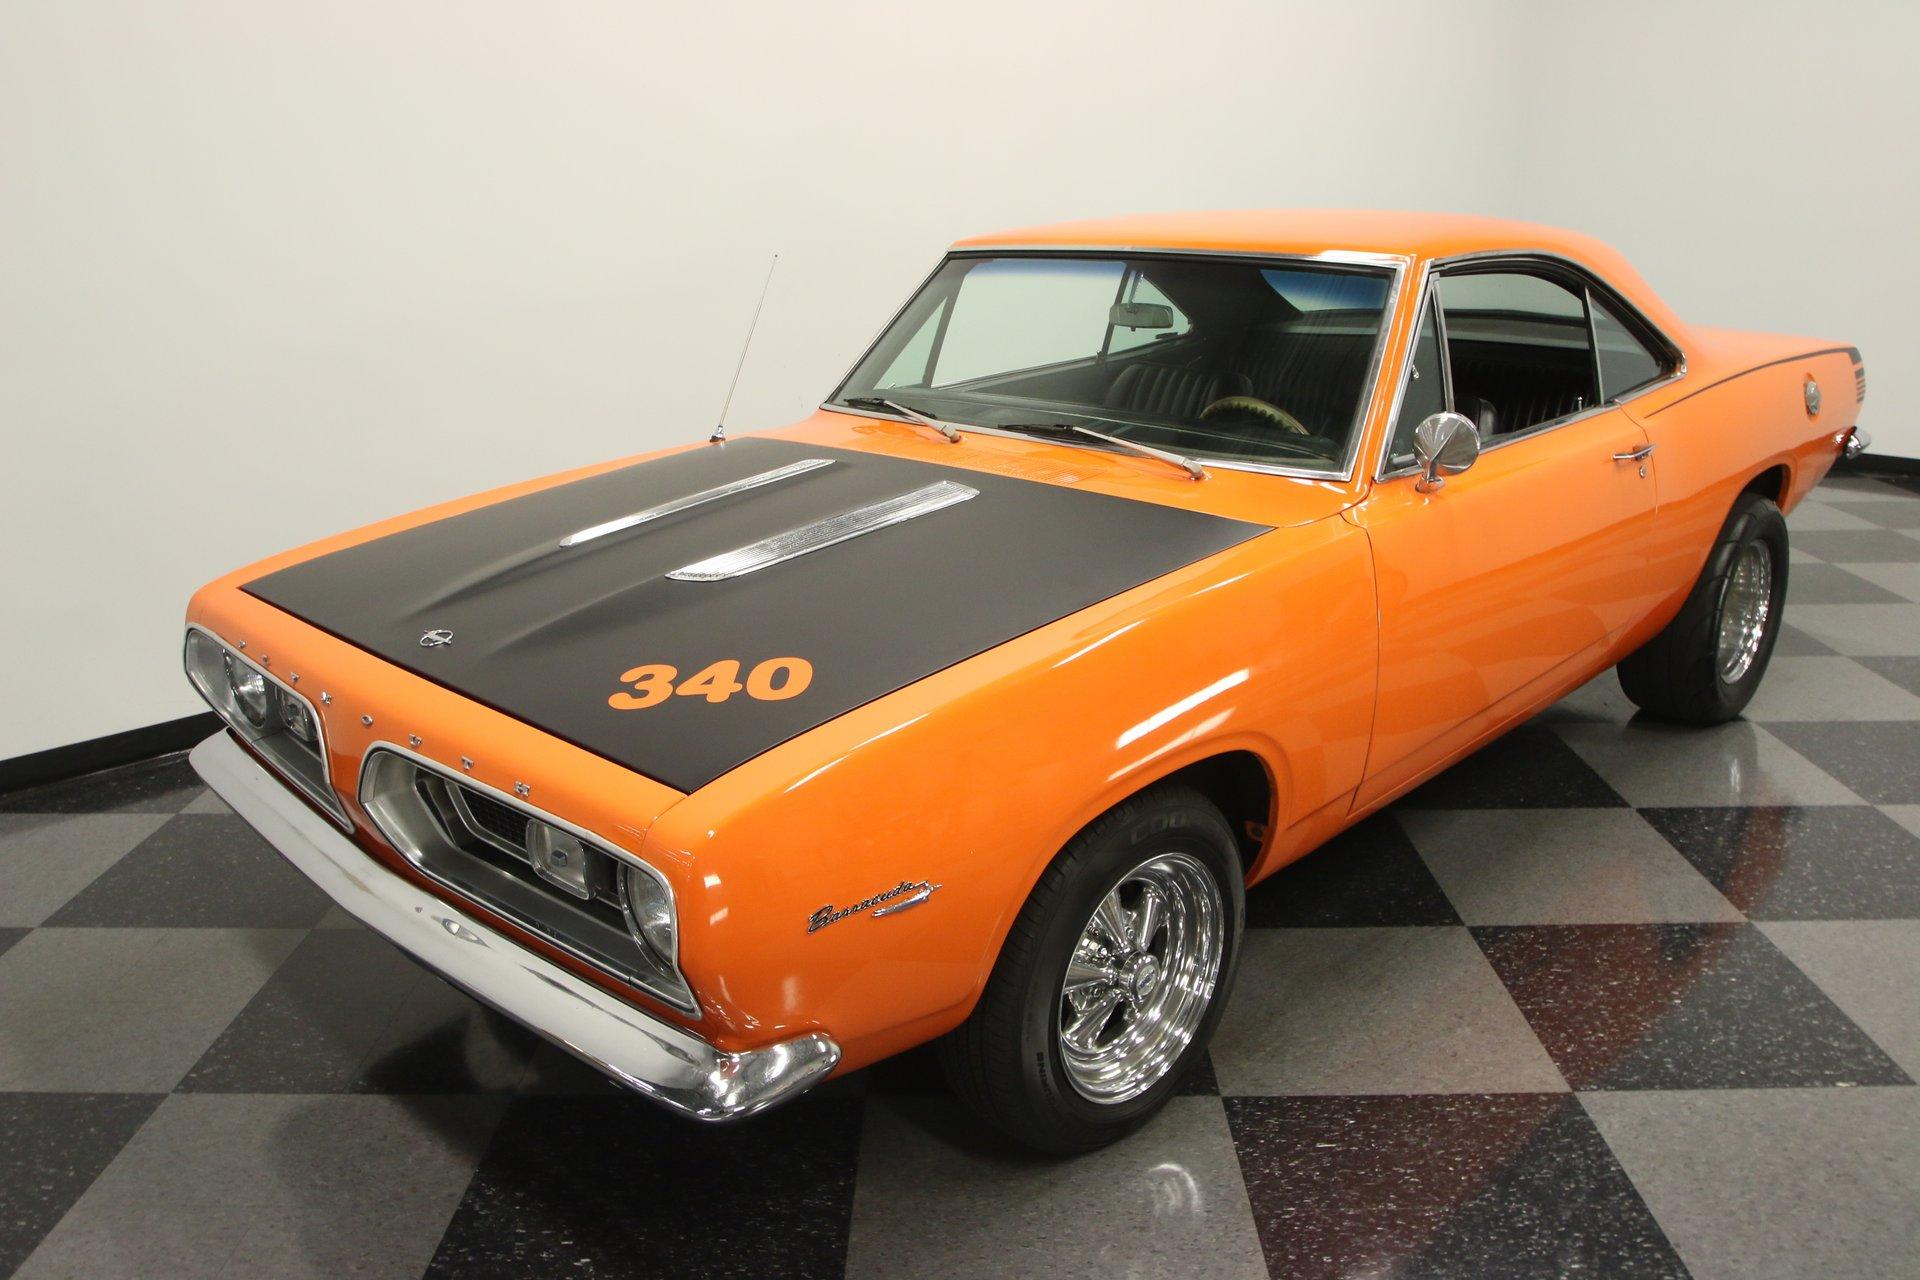 1967 Plymouth Barracuda | Streetside Classics - The Nation's